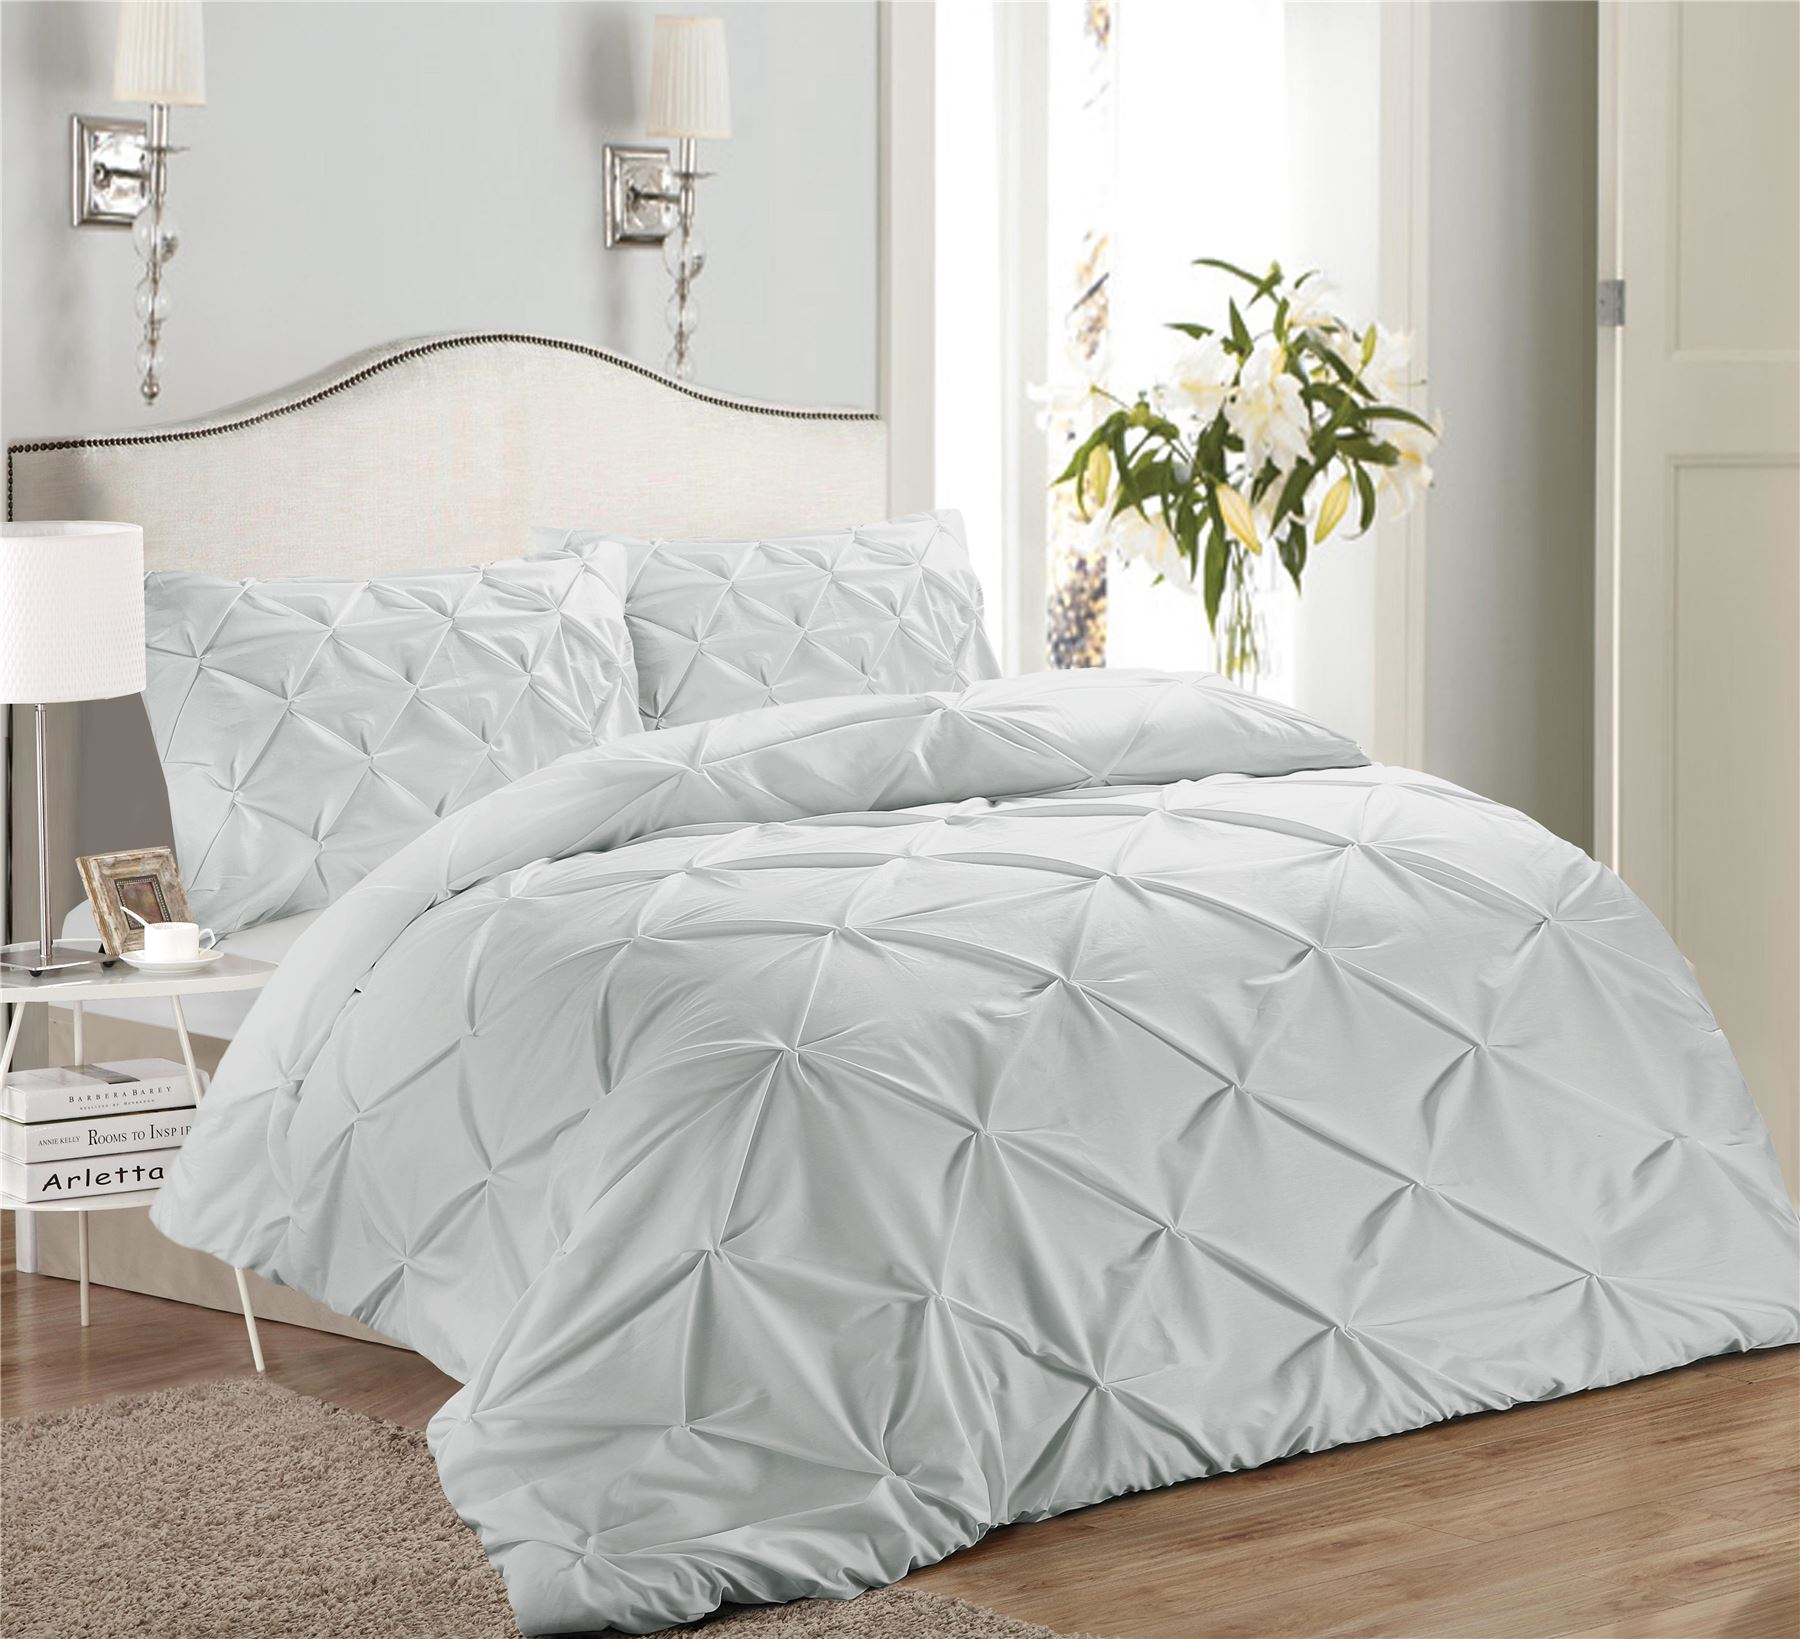 Luxury-Pure-100-Cotton-200-Thread-Pinch-Pleat-Pintuck-Puckering-Duvet-Cover-Set thumbnail 45